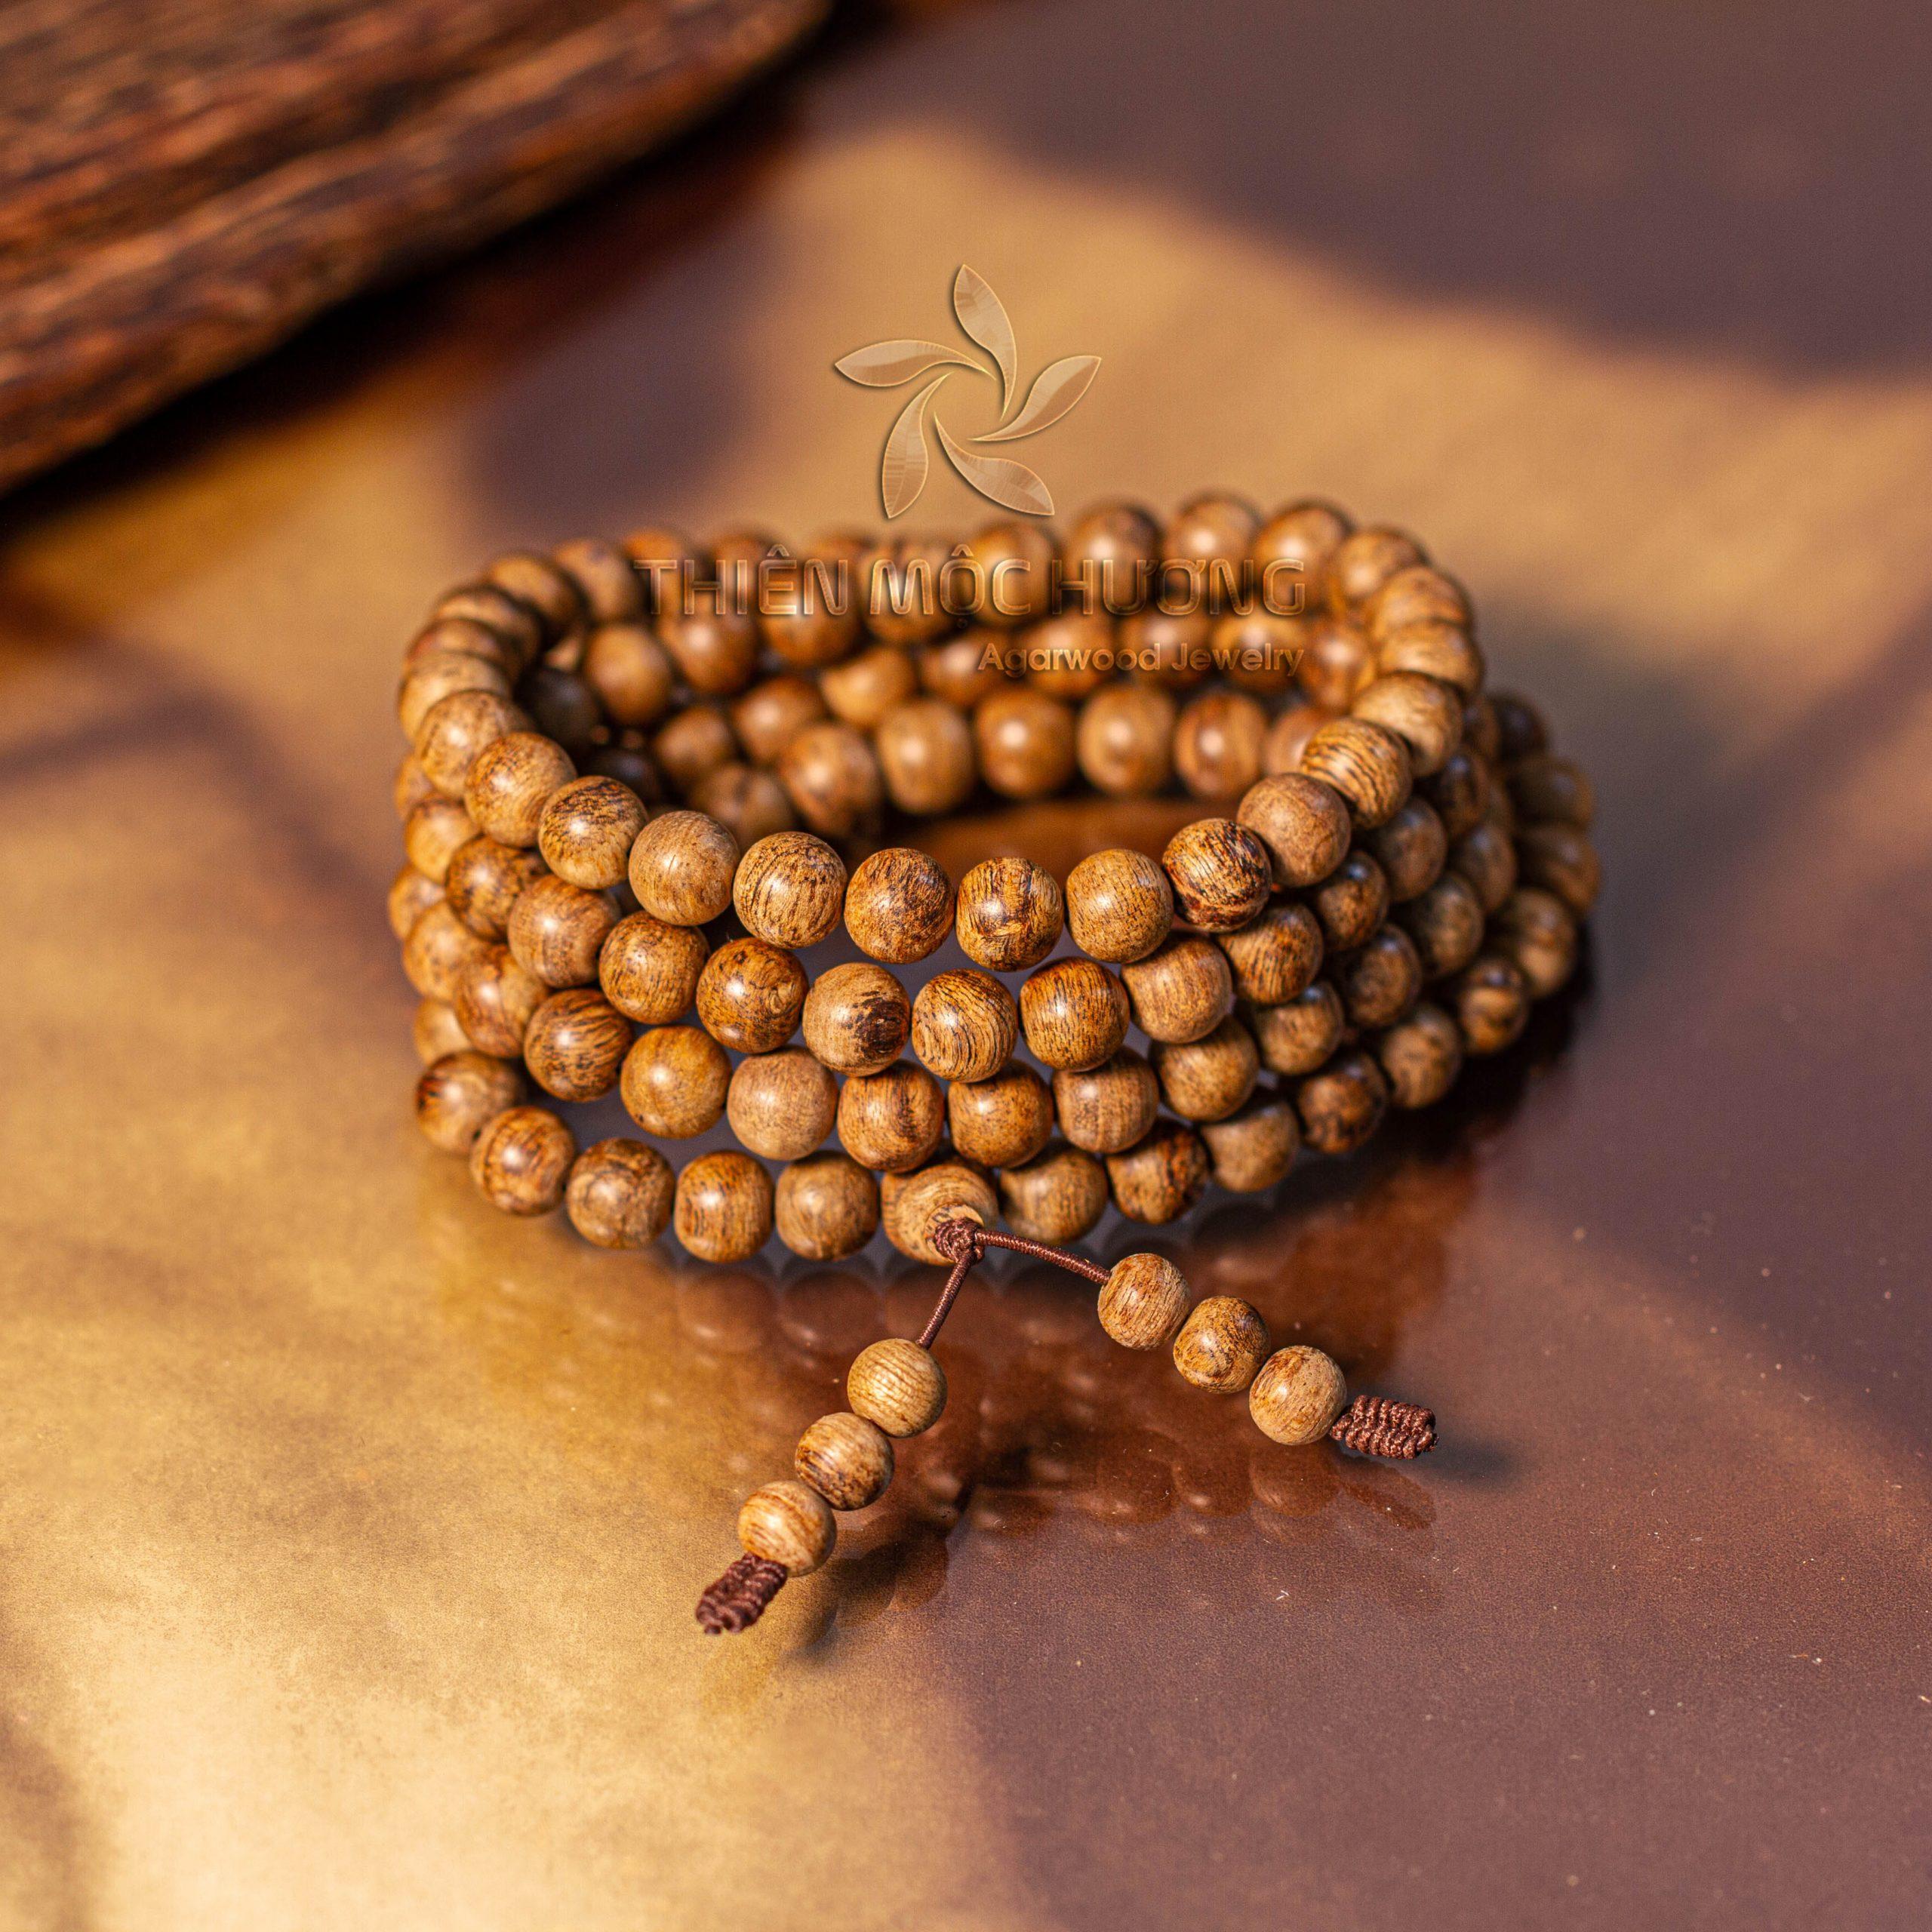 Philippines 108 mala beads bracelet - classic